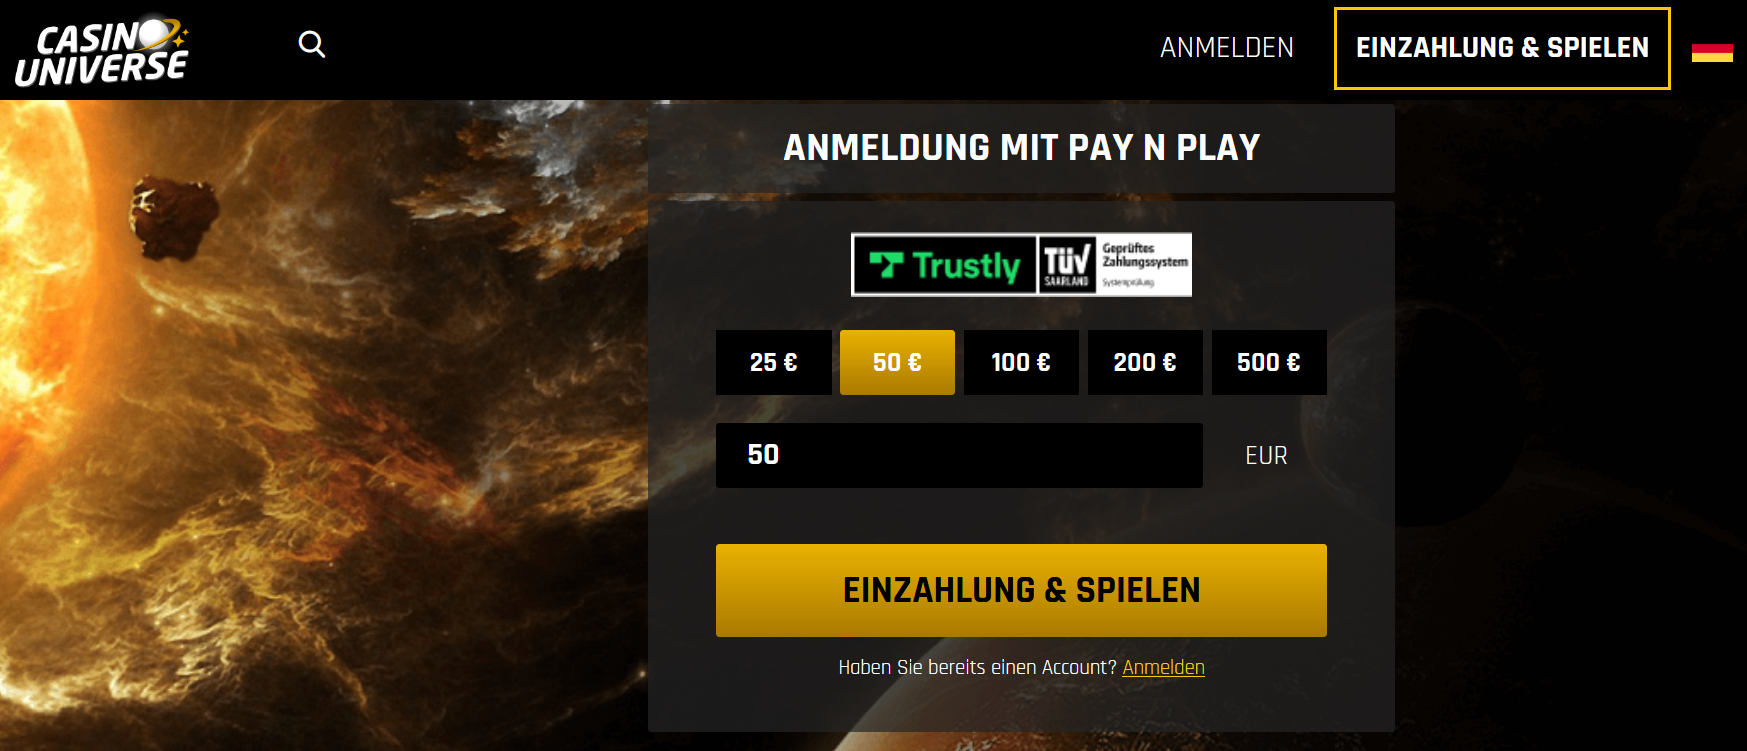 Casinouniverse Pay n Play